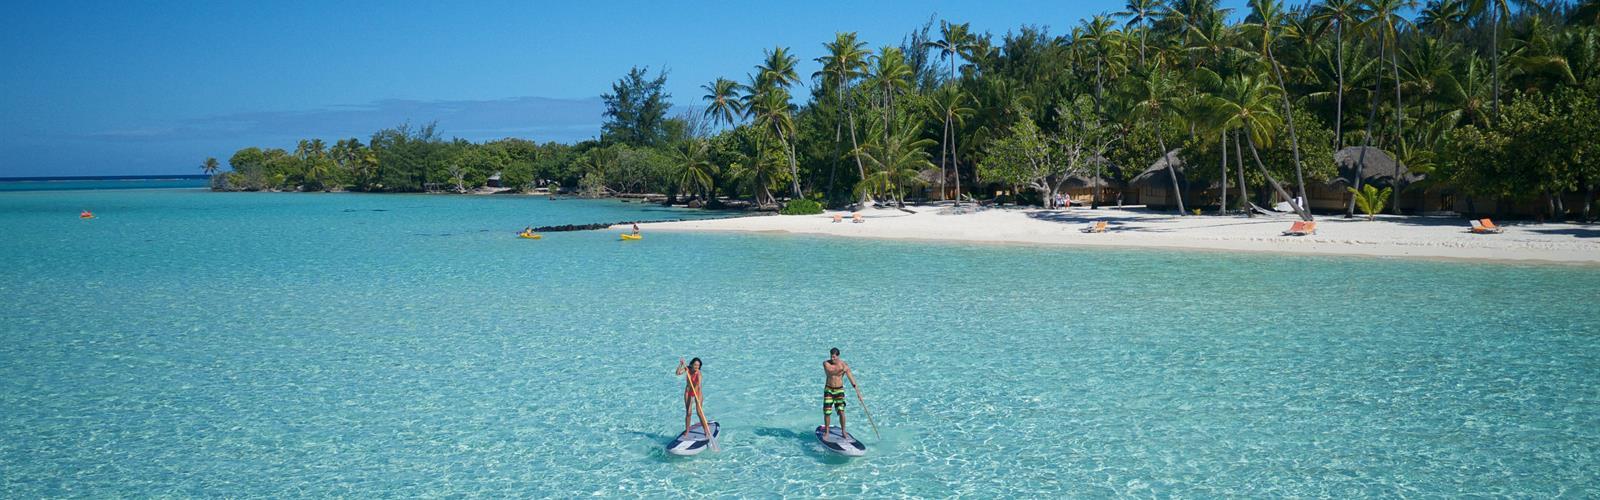 Bora Bora Pearl Beach Resort Spa Activities